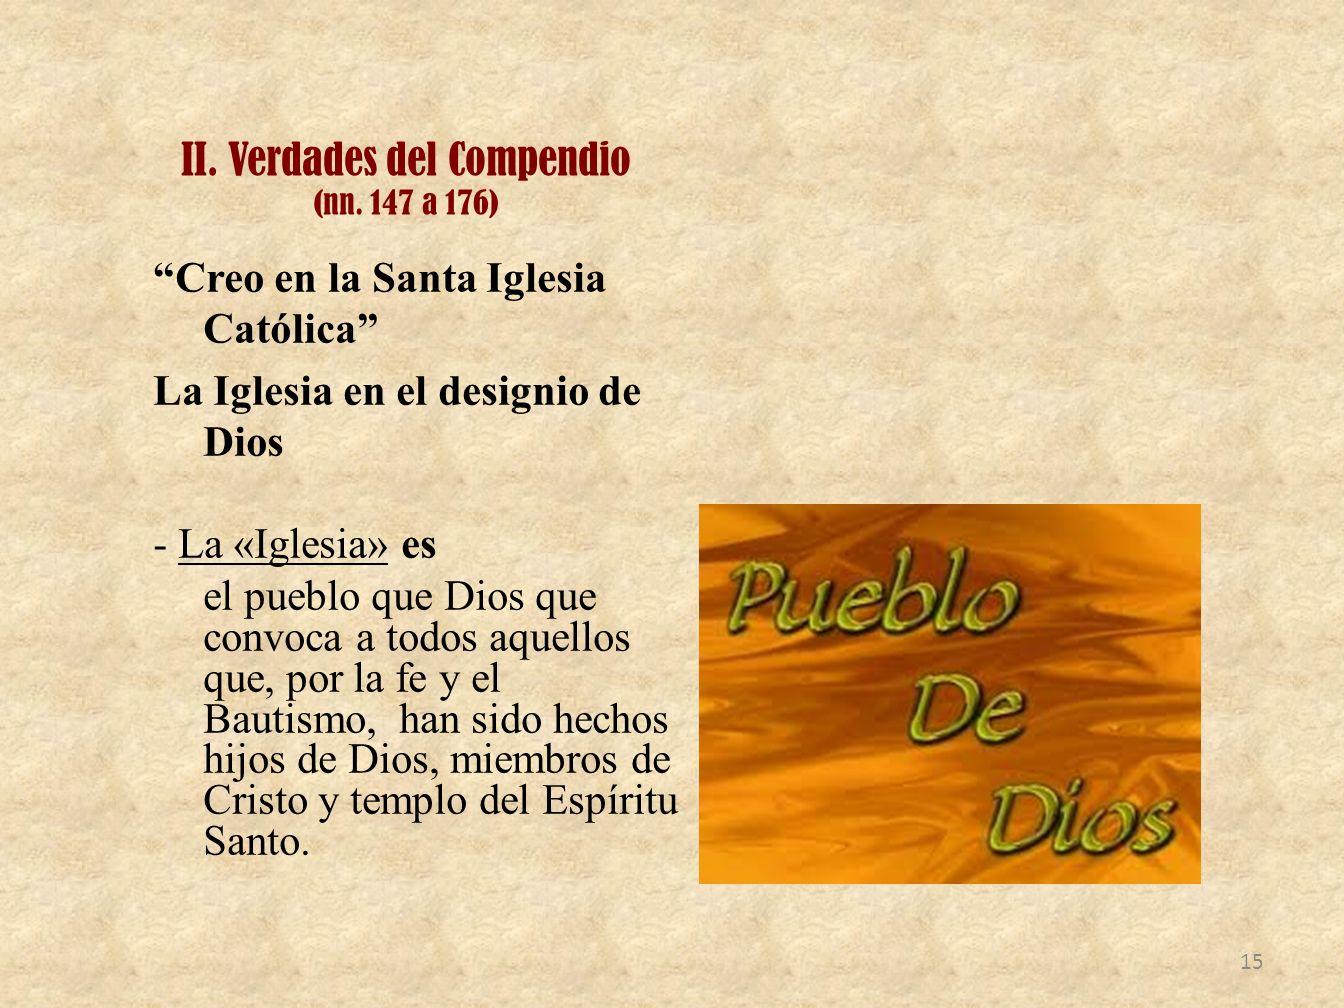 II. Verdades del Compendio (nn. 147 a 176)